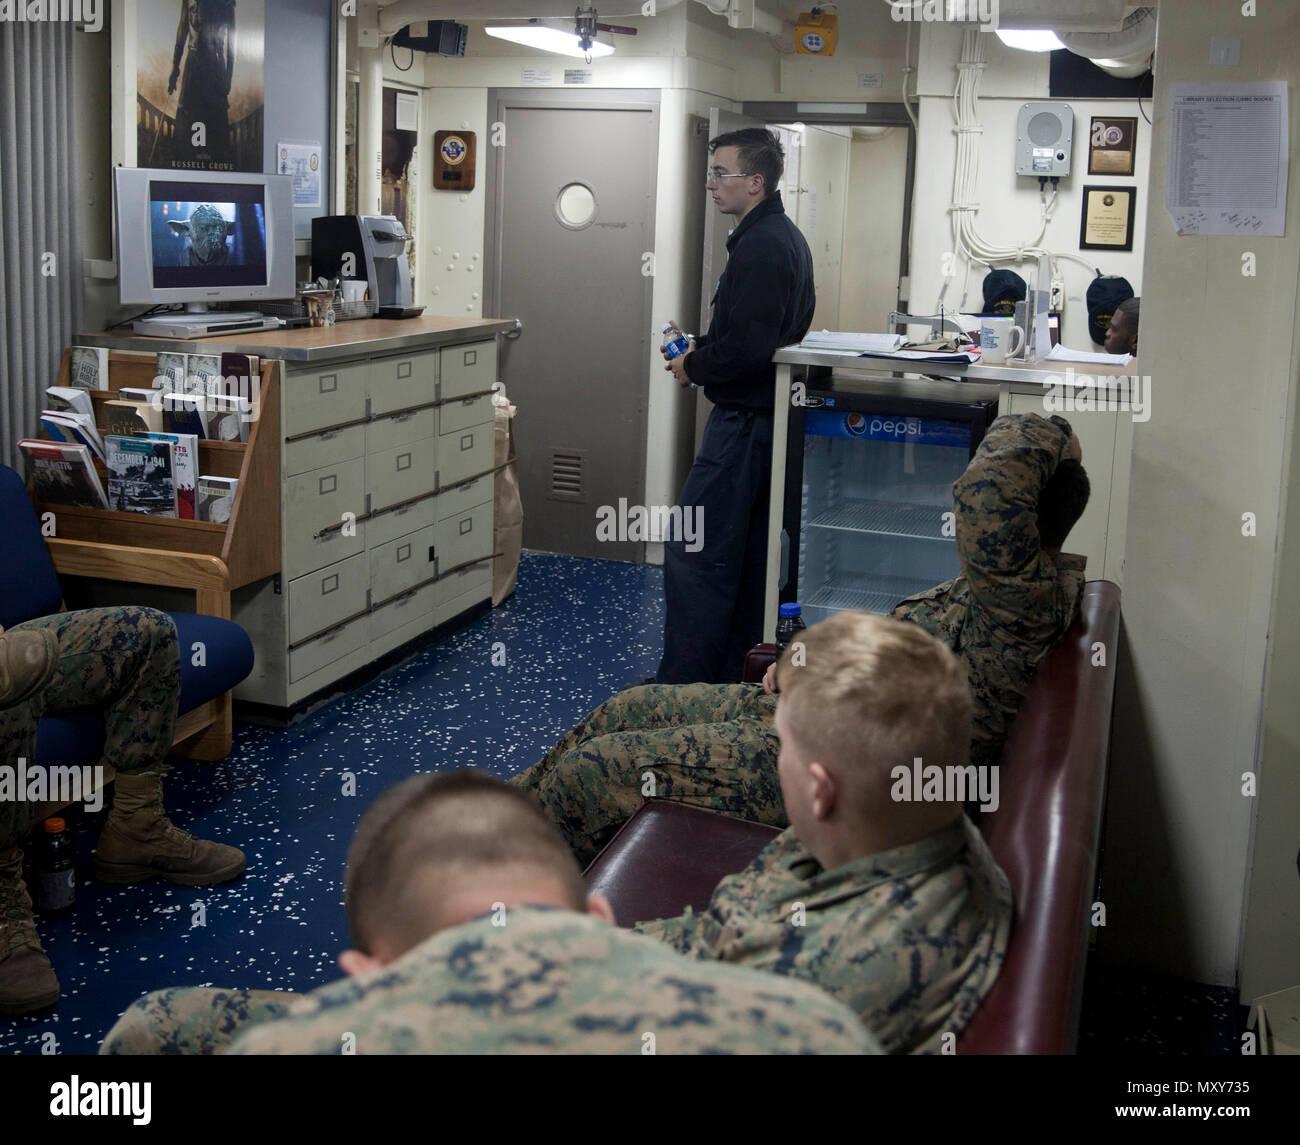 Amphibious Pelicula los infantes de marina de la 24ª unidad expedicionaria de